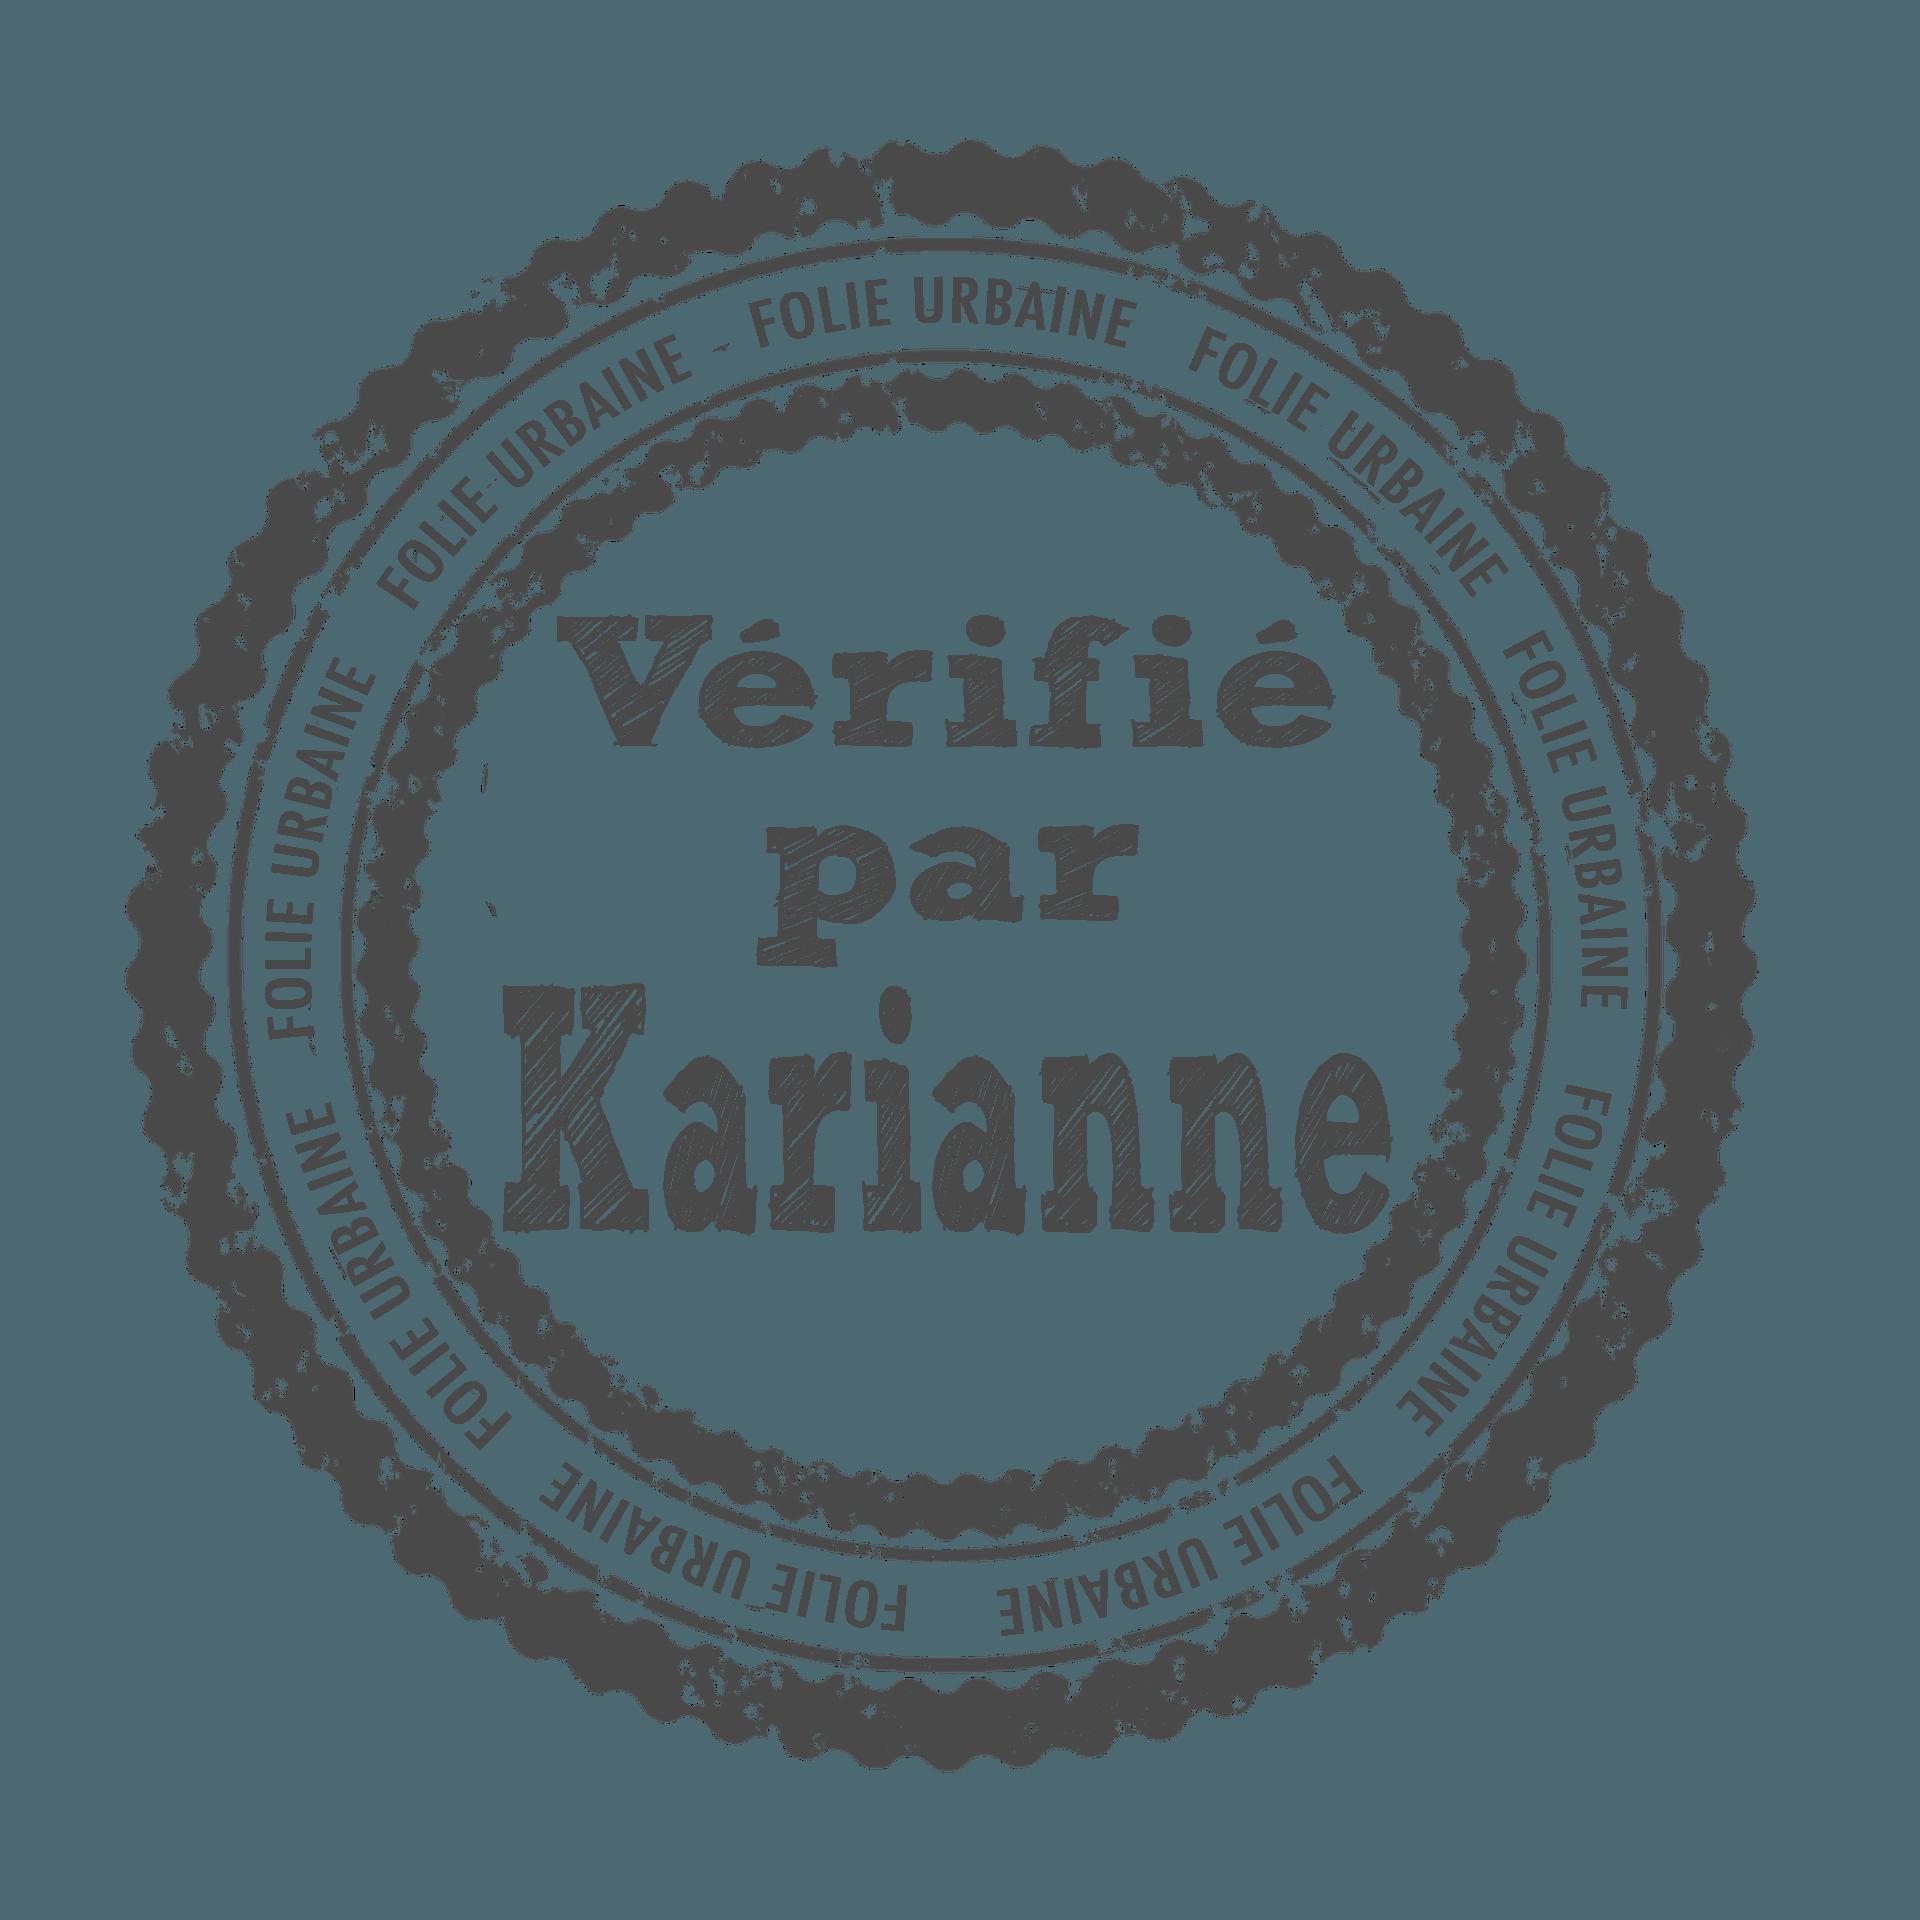 Folie Urbaine reviseur Karianne